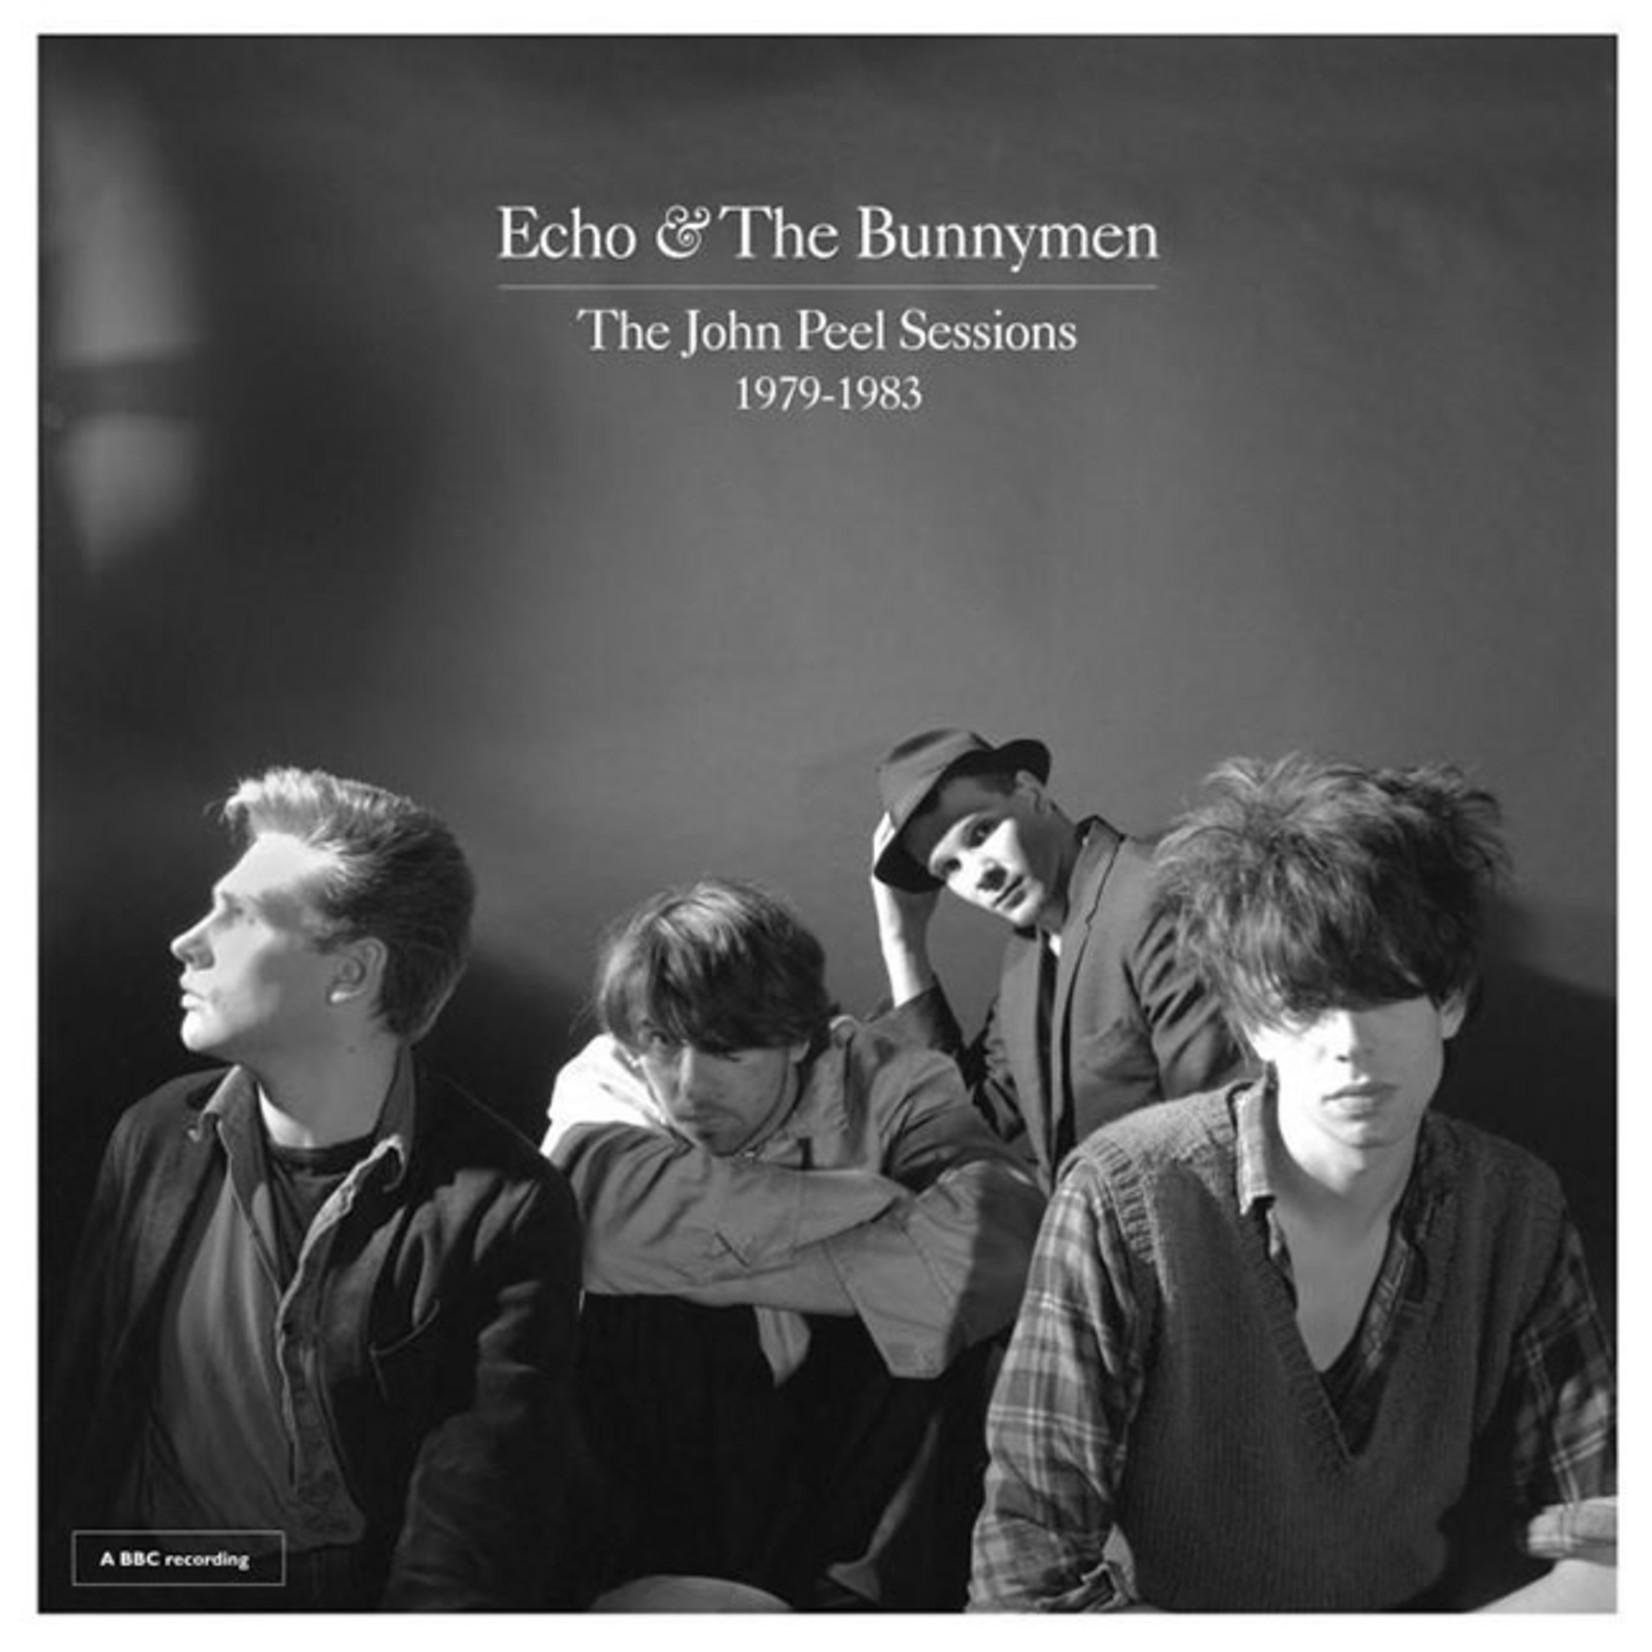 [New] Echo & the Bunnymen: The John Peel Sessions 1979-1983 (2LP)